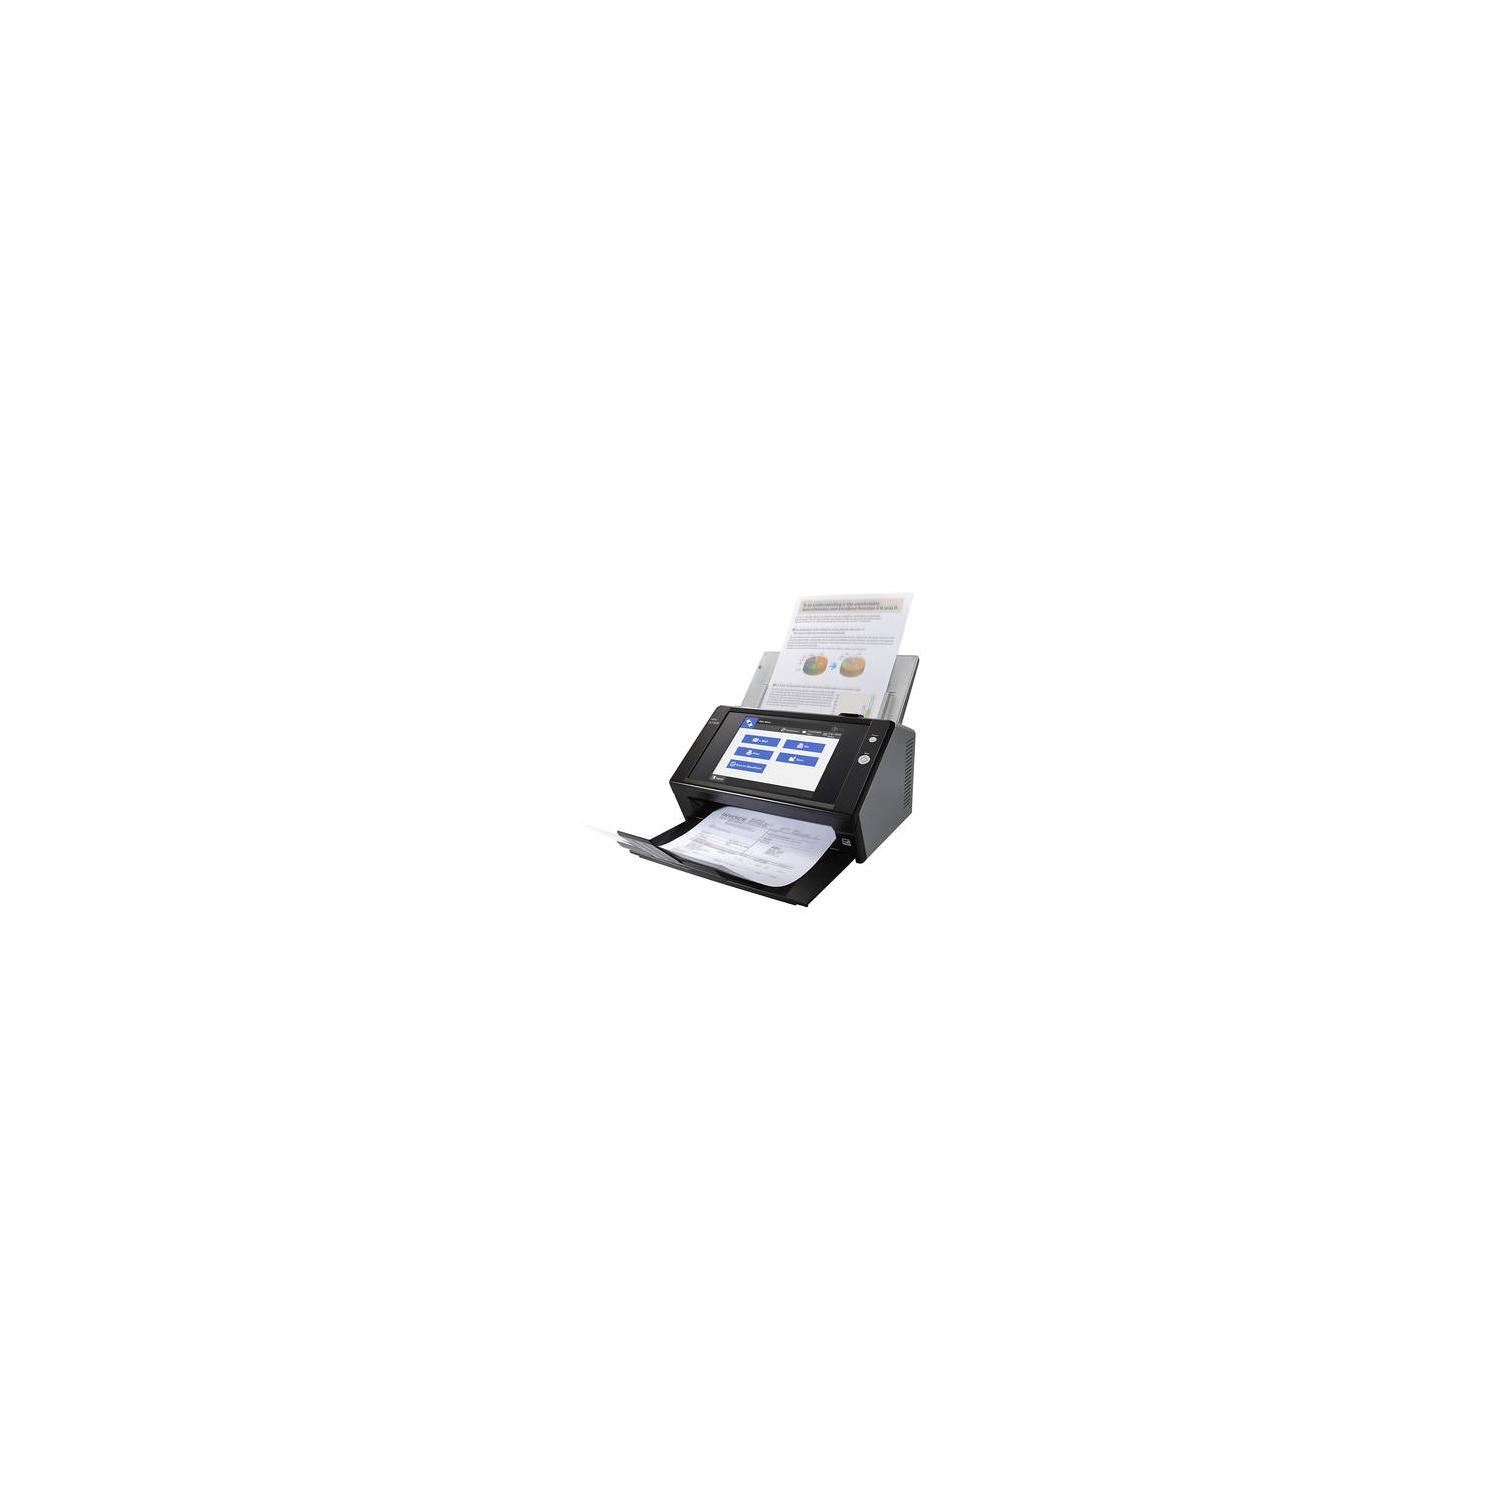 Fujitsu Document Scanner N7100 Pa03706 B205 Scanners Best Buy Fi Series Network Canada